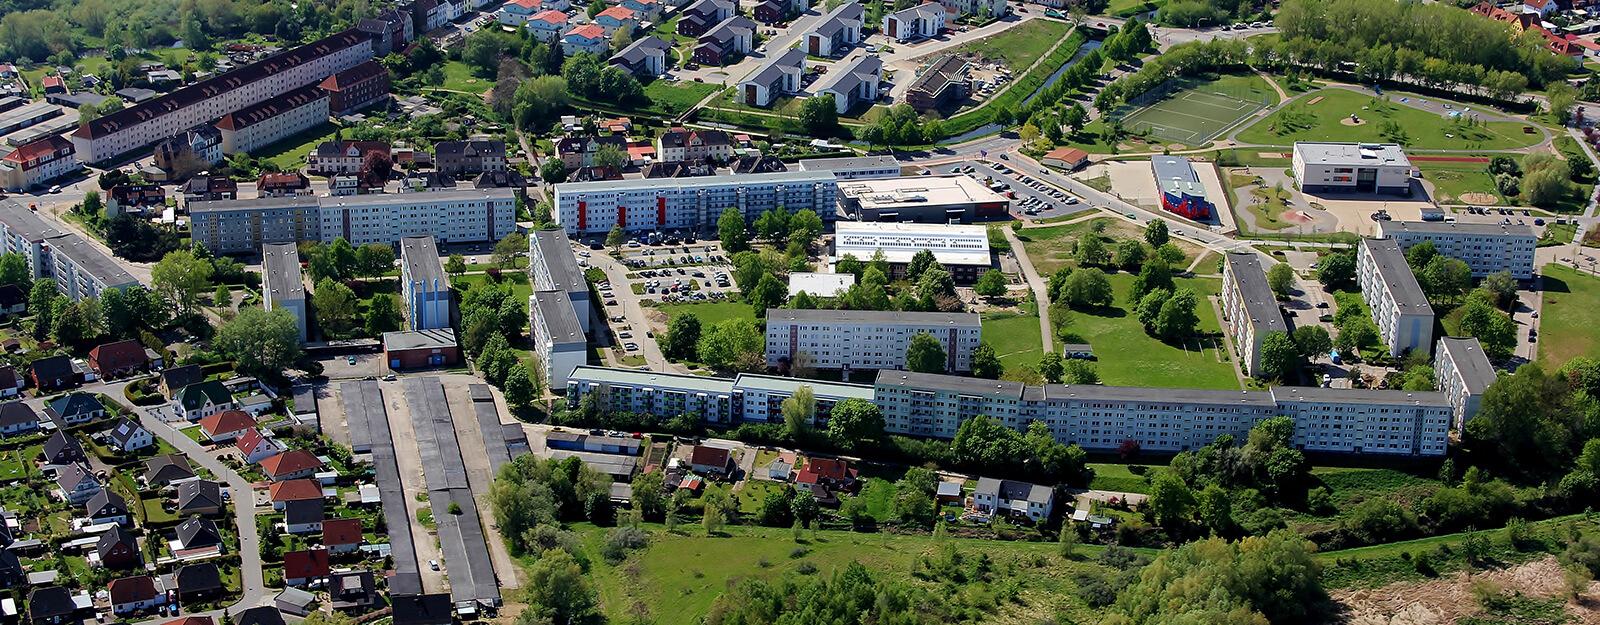 Referenz-Wismar_03-1600x625